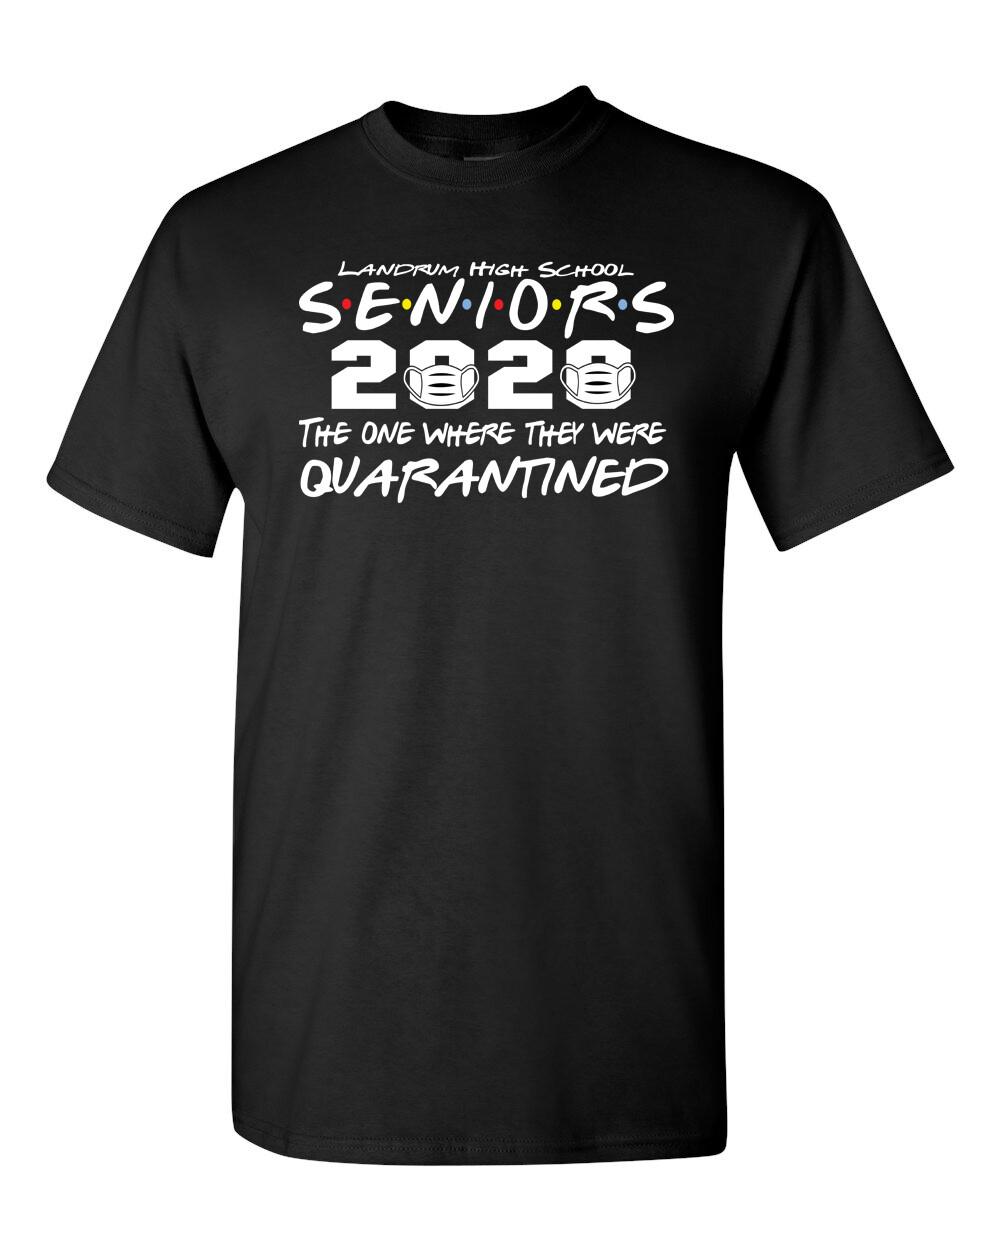 2020 Landrum High Senior Tee